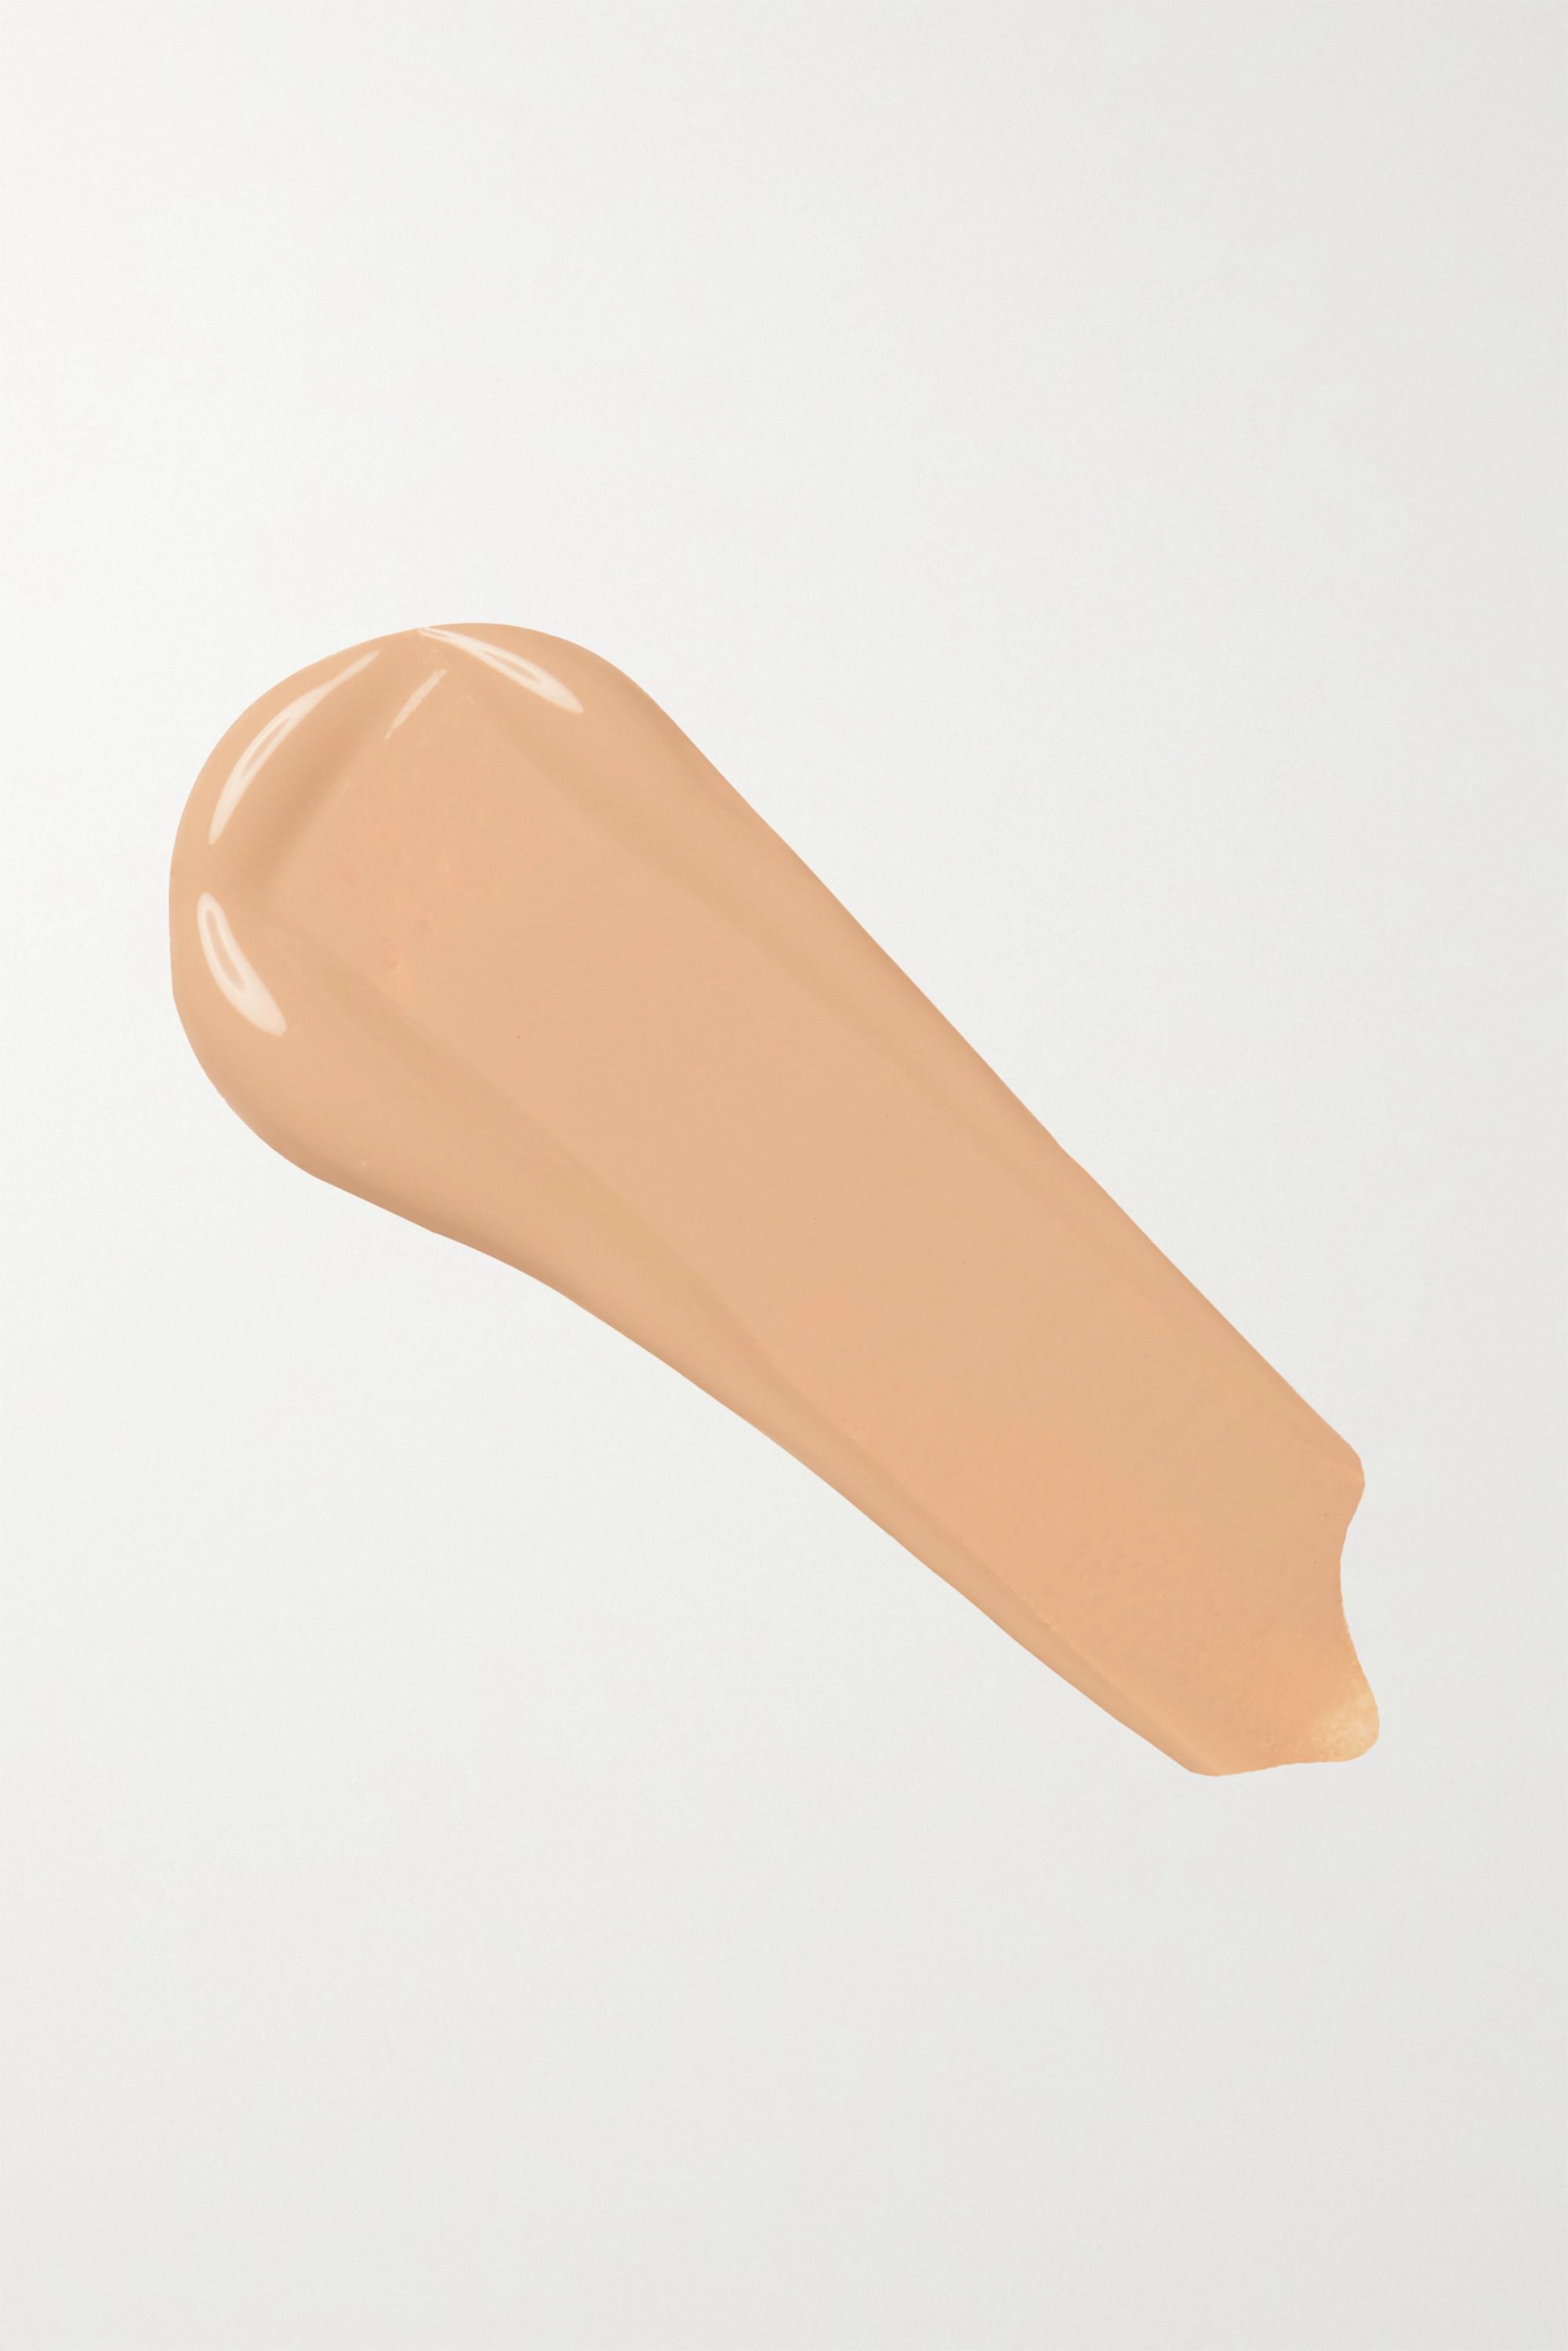 Surratt Beauty Dew Drop Foundation – 5, 19 ml – Foundation